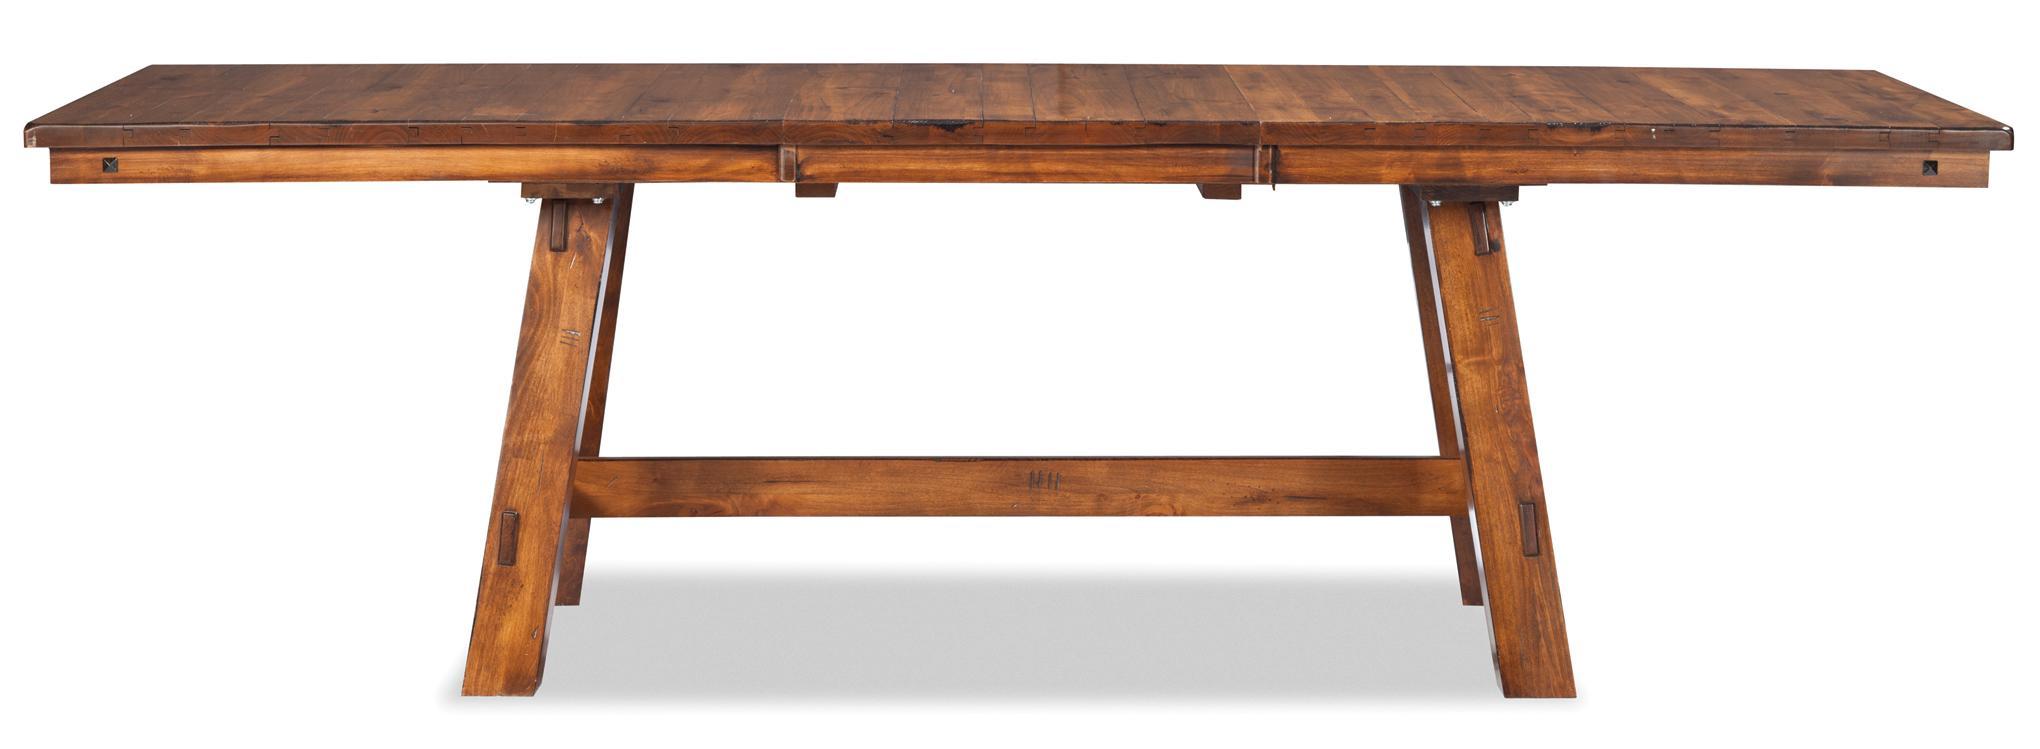 Intercon Timberline Trestle Table   Item Number: TL TA 42100 SAD  Part 89